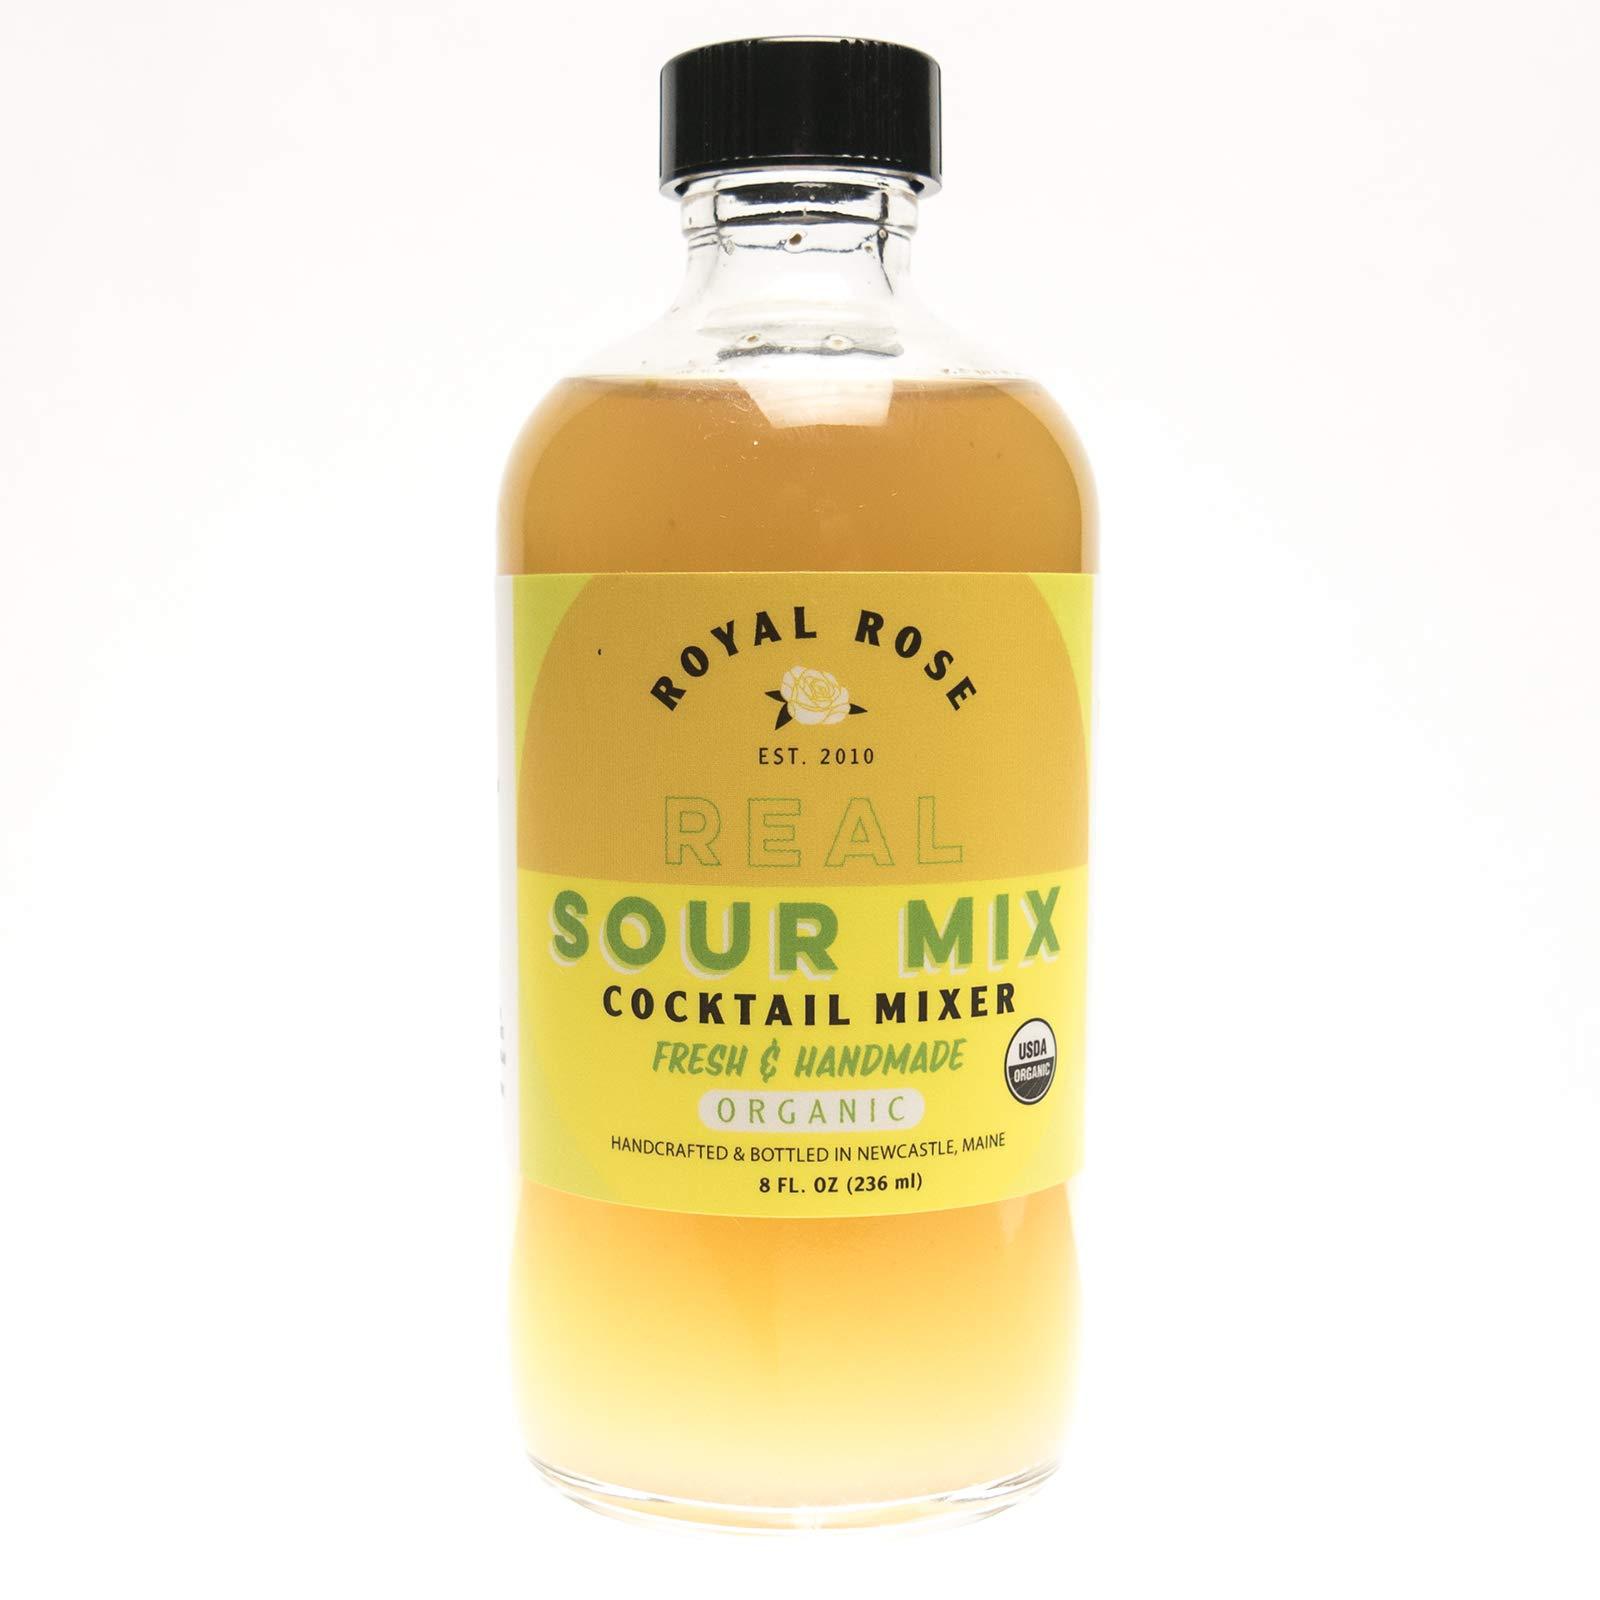 Royal Rose Organic Sour Drink Mix, 8 oz